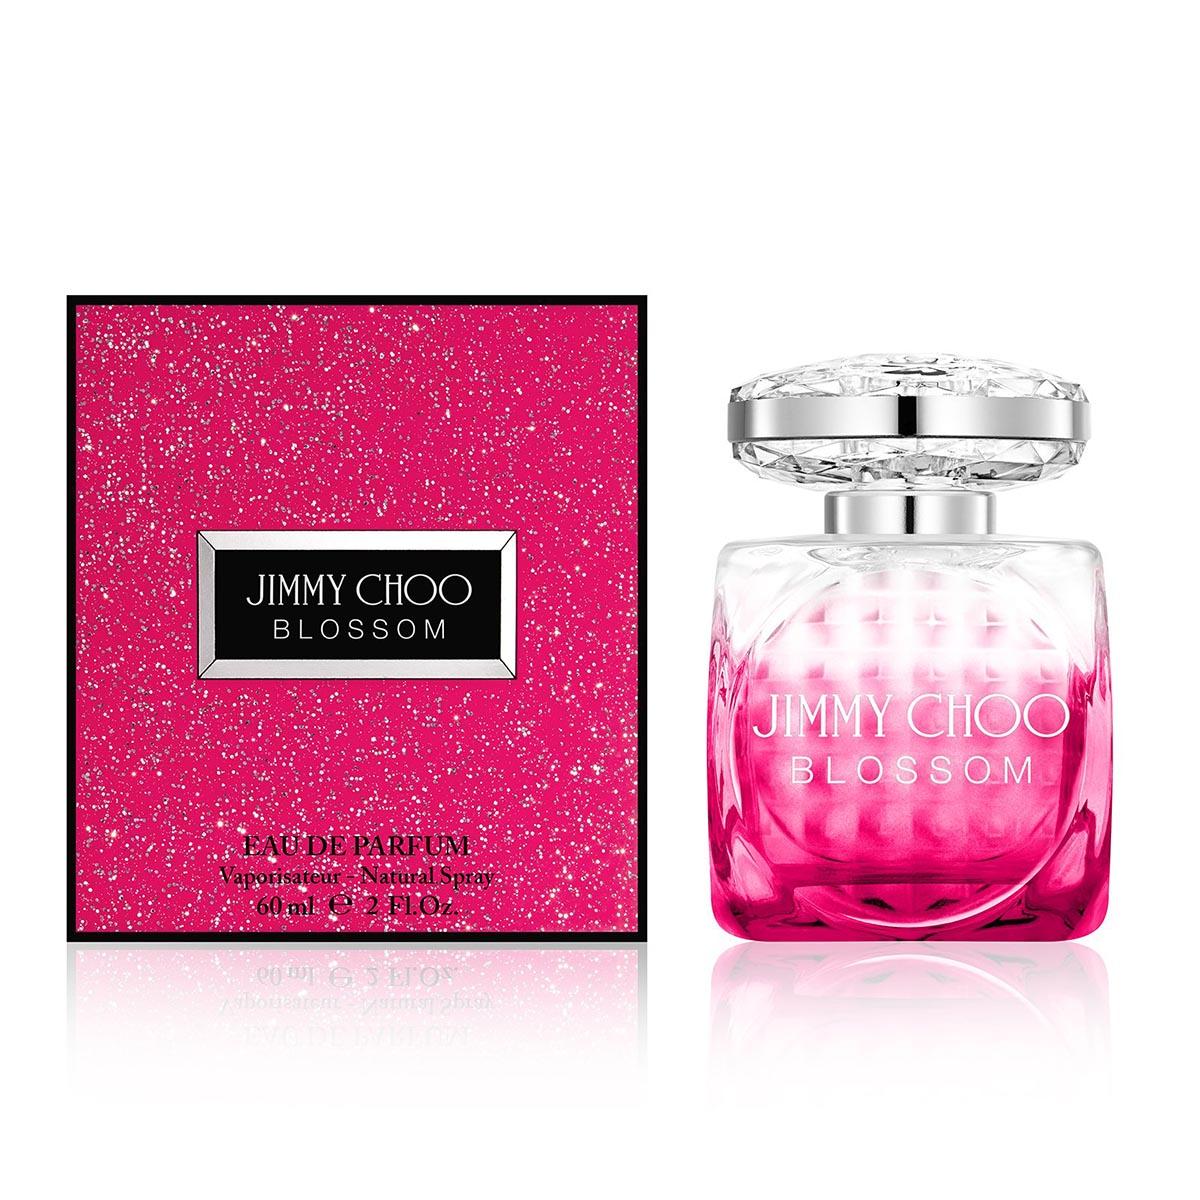 Jimmy choo blossom eau de parfum 60ml vaporizador